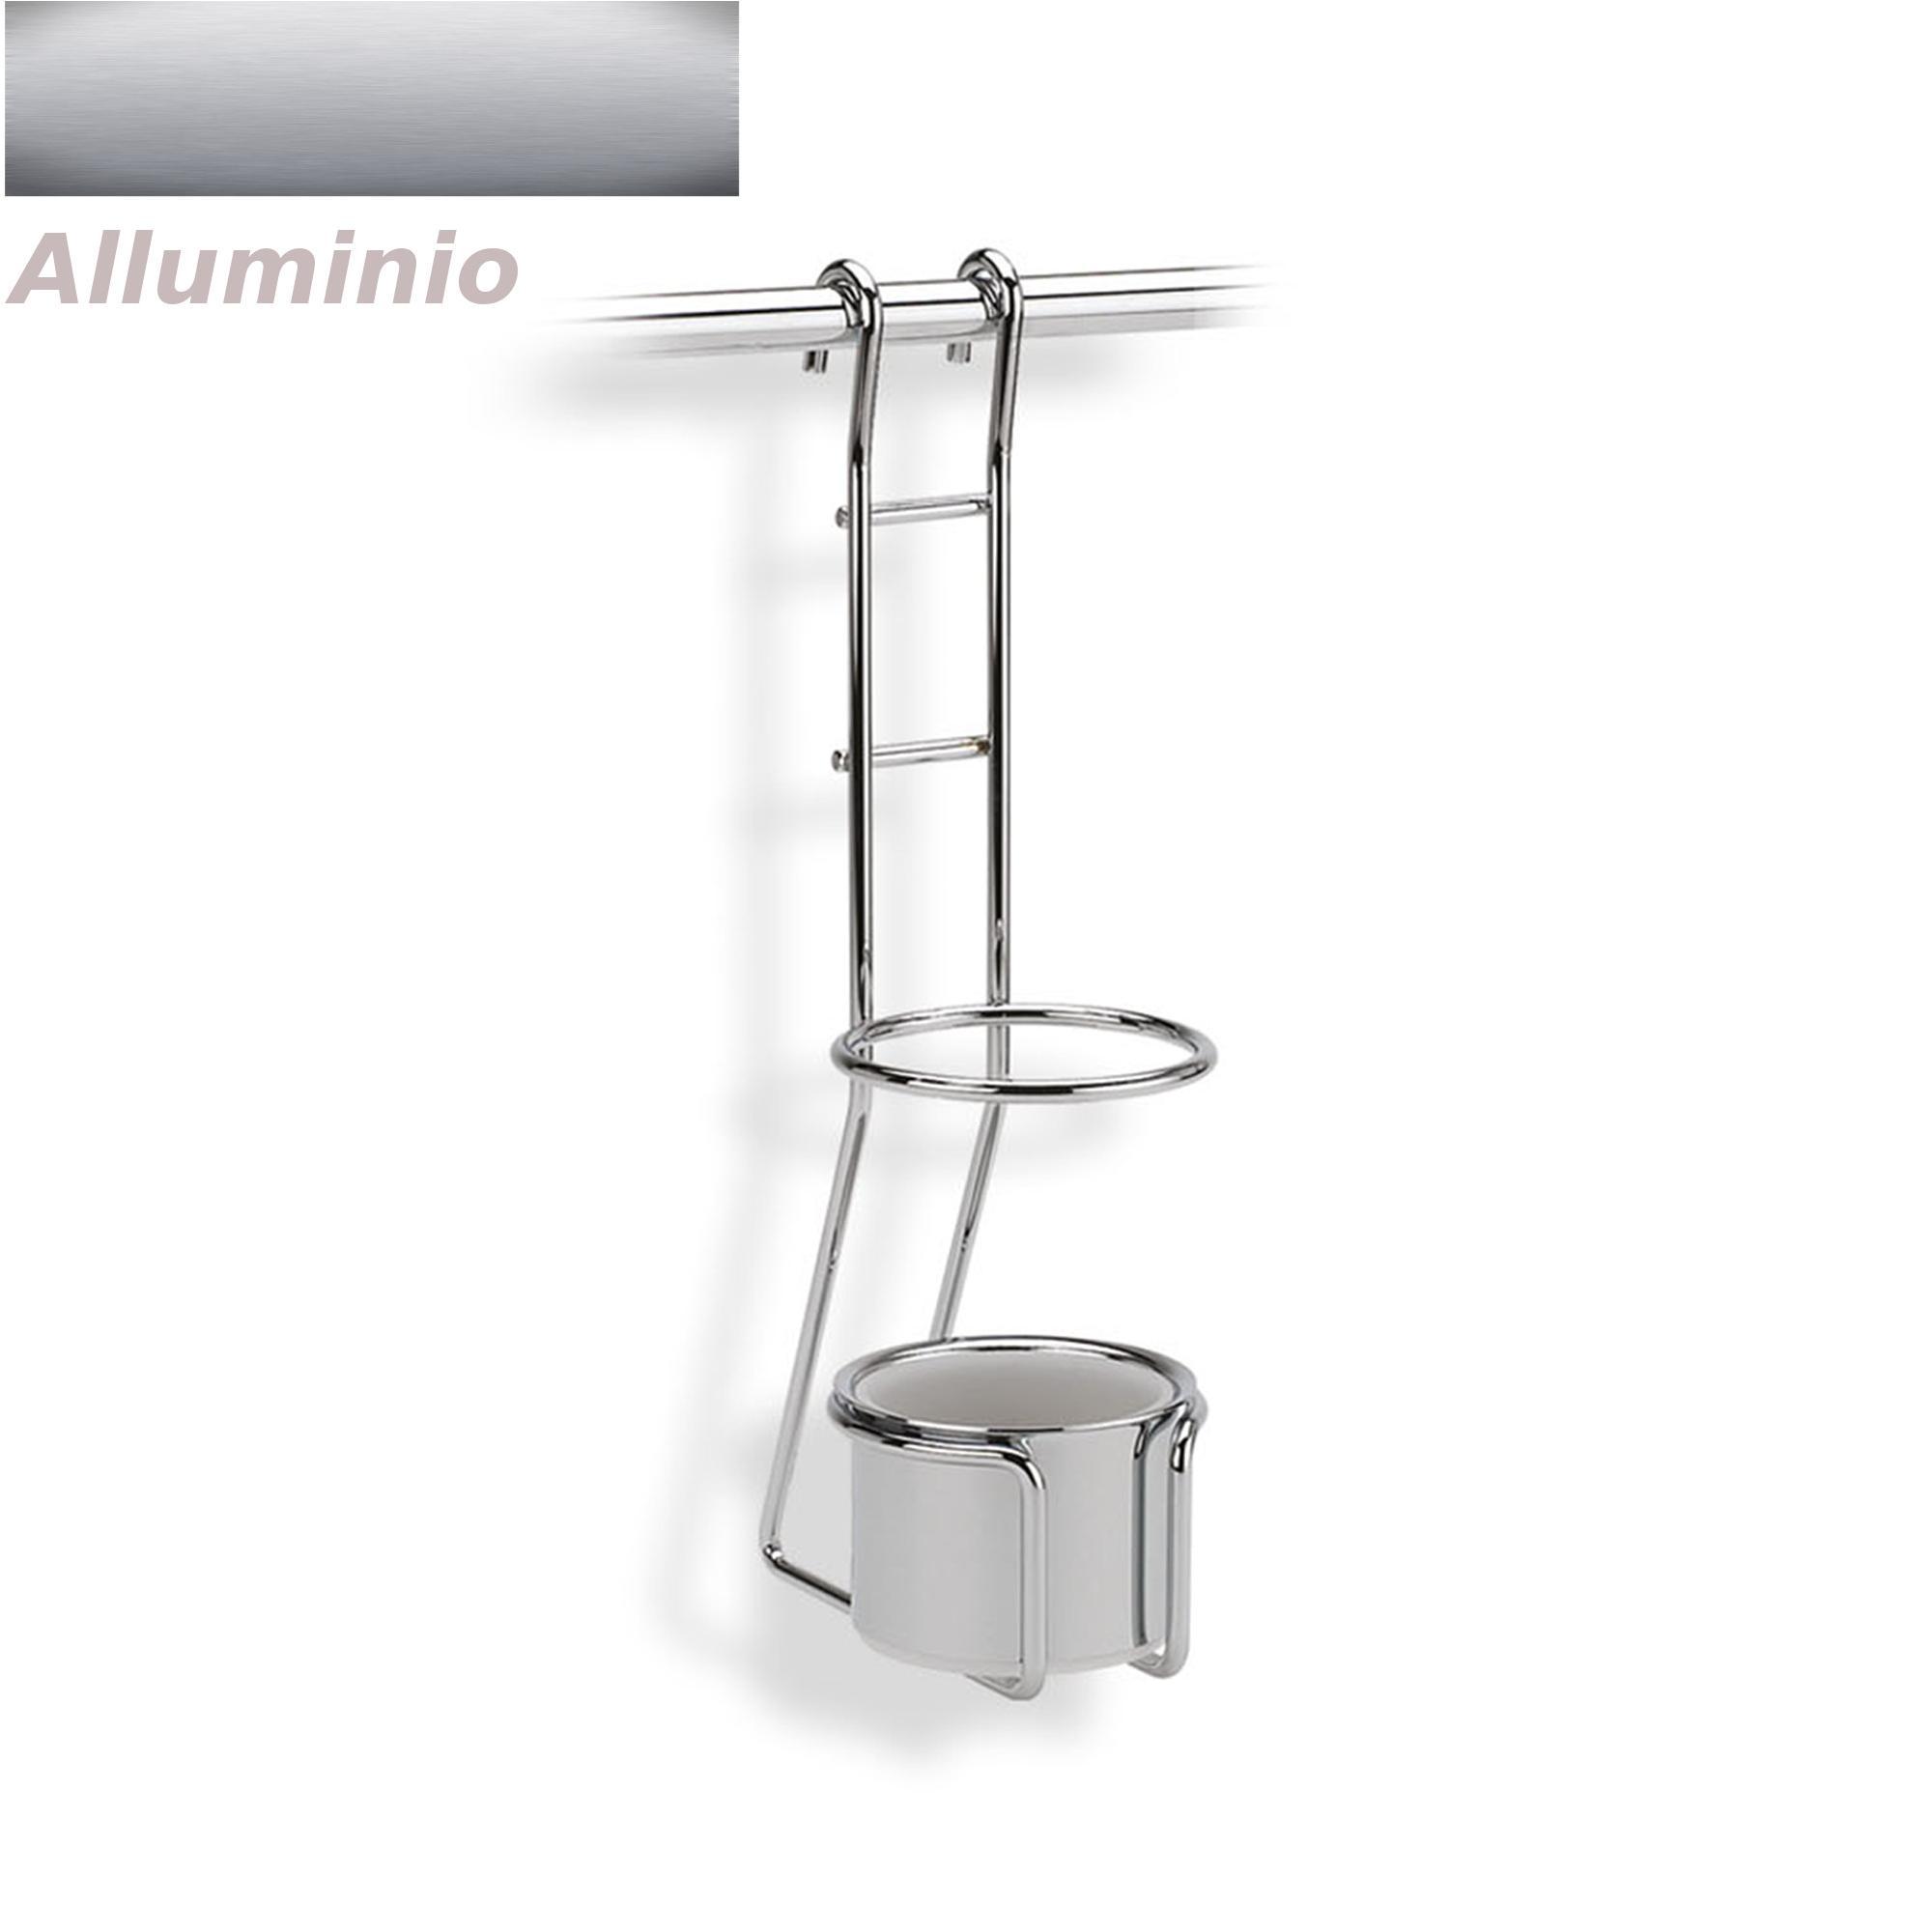 Best porta utensili da cucina gallery design ideas - Portamestoli ikea ...